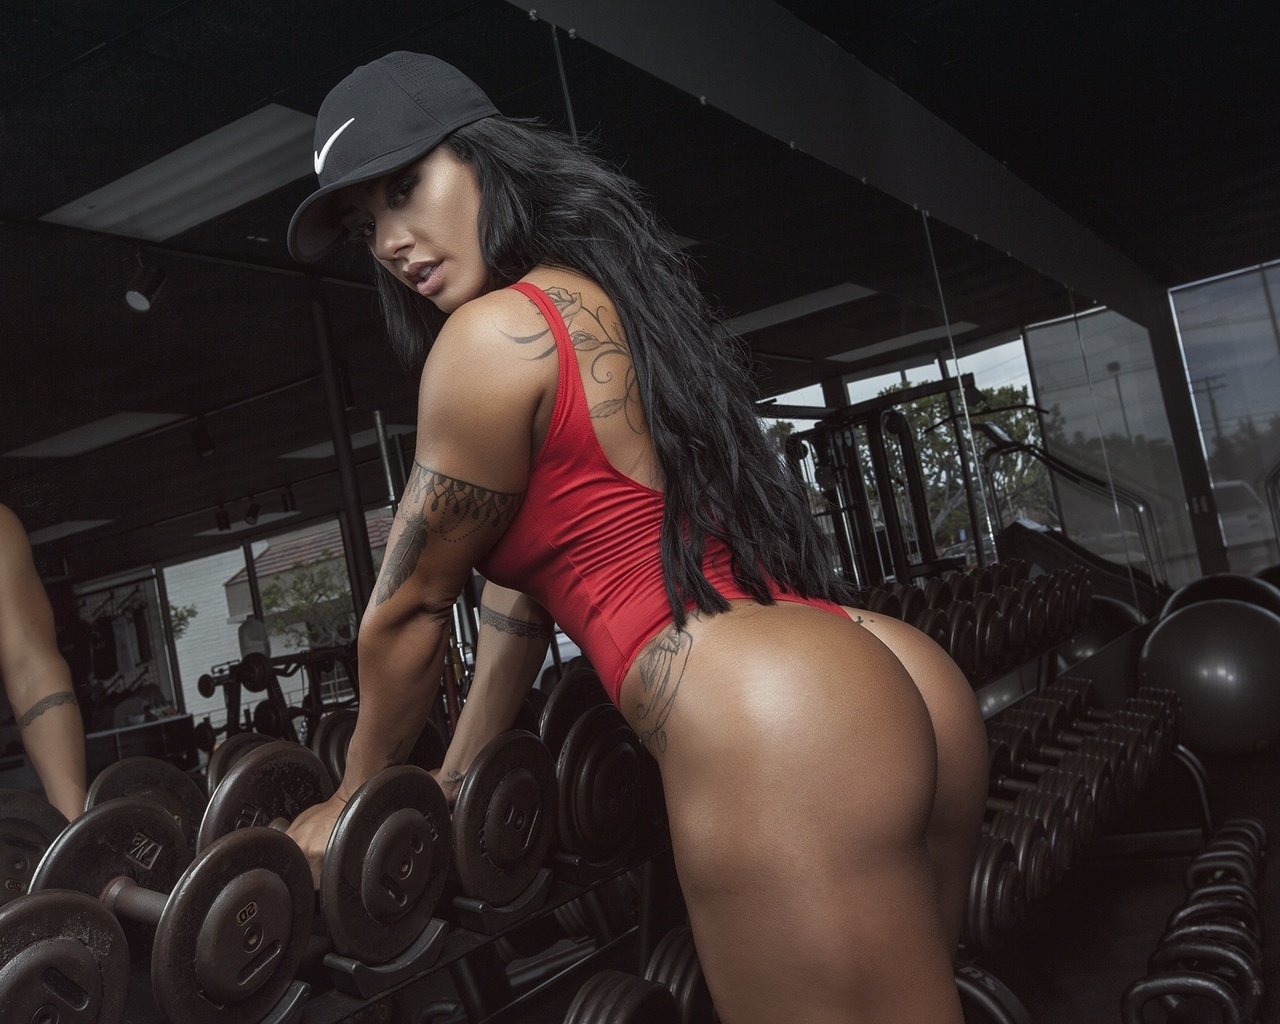 девушка, спорт, фитнес, sue lasmar